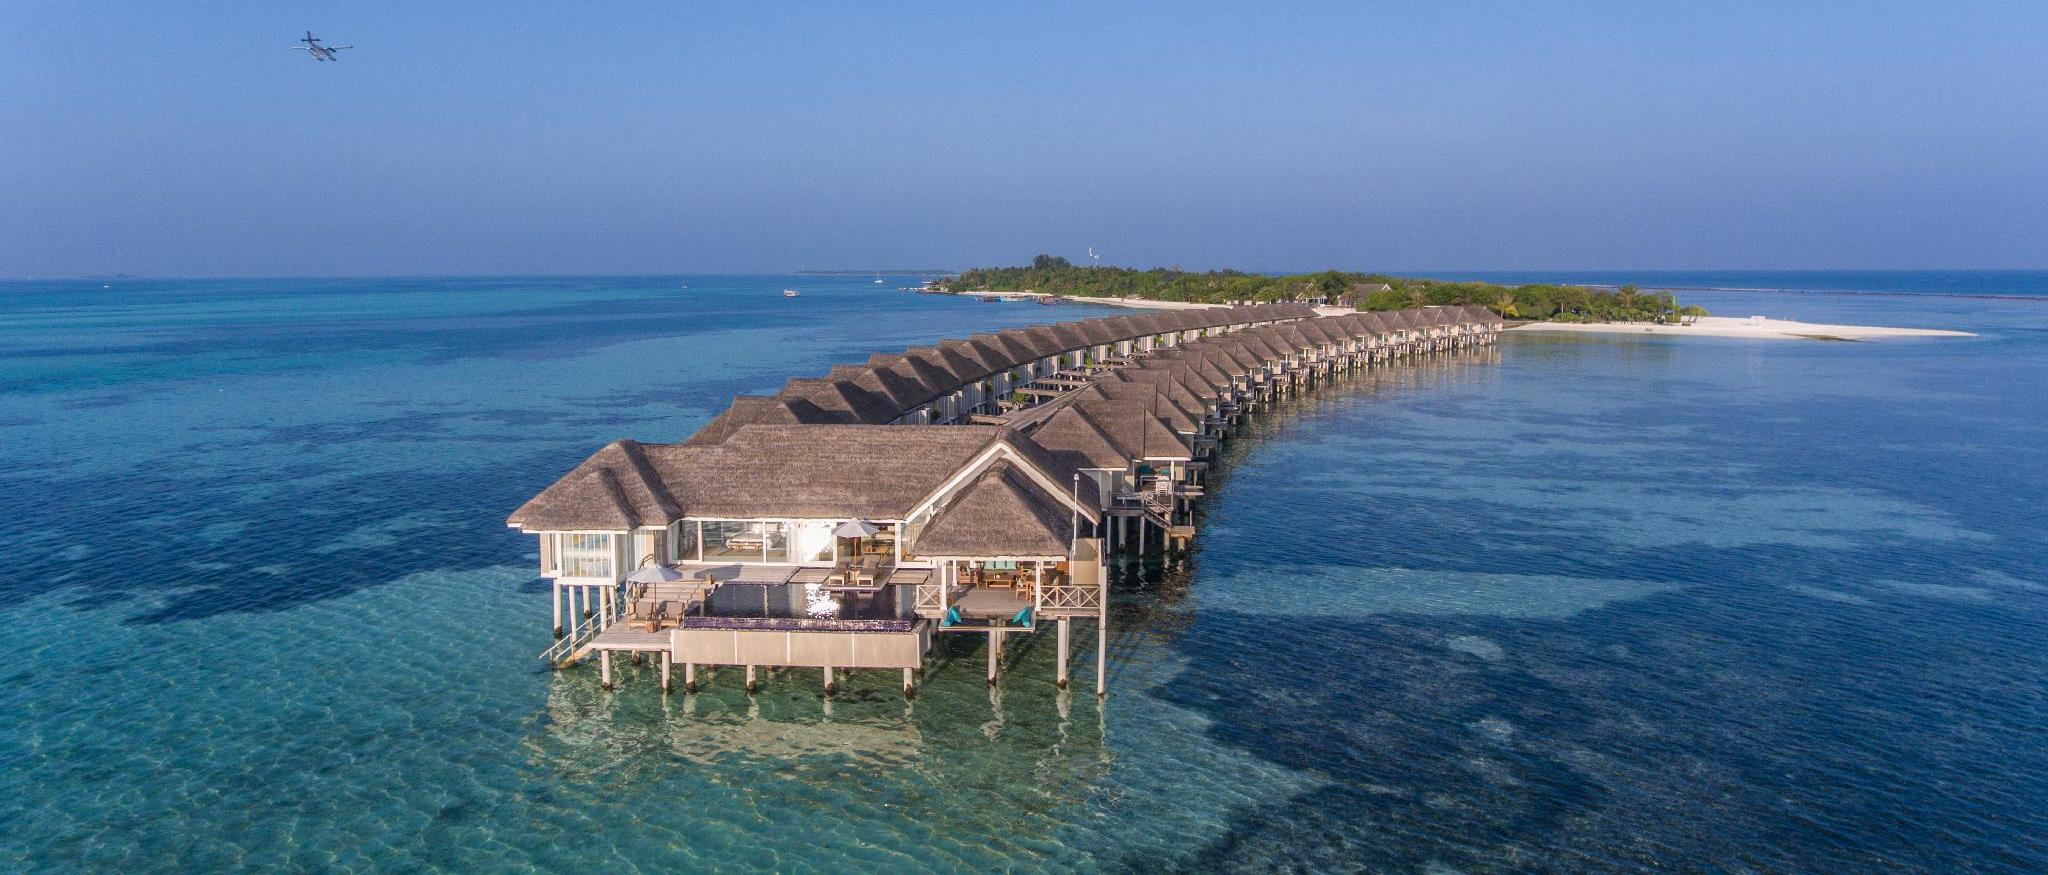 LUX South Ari Atoll Resort and Villas